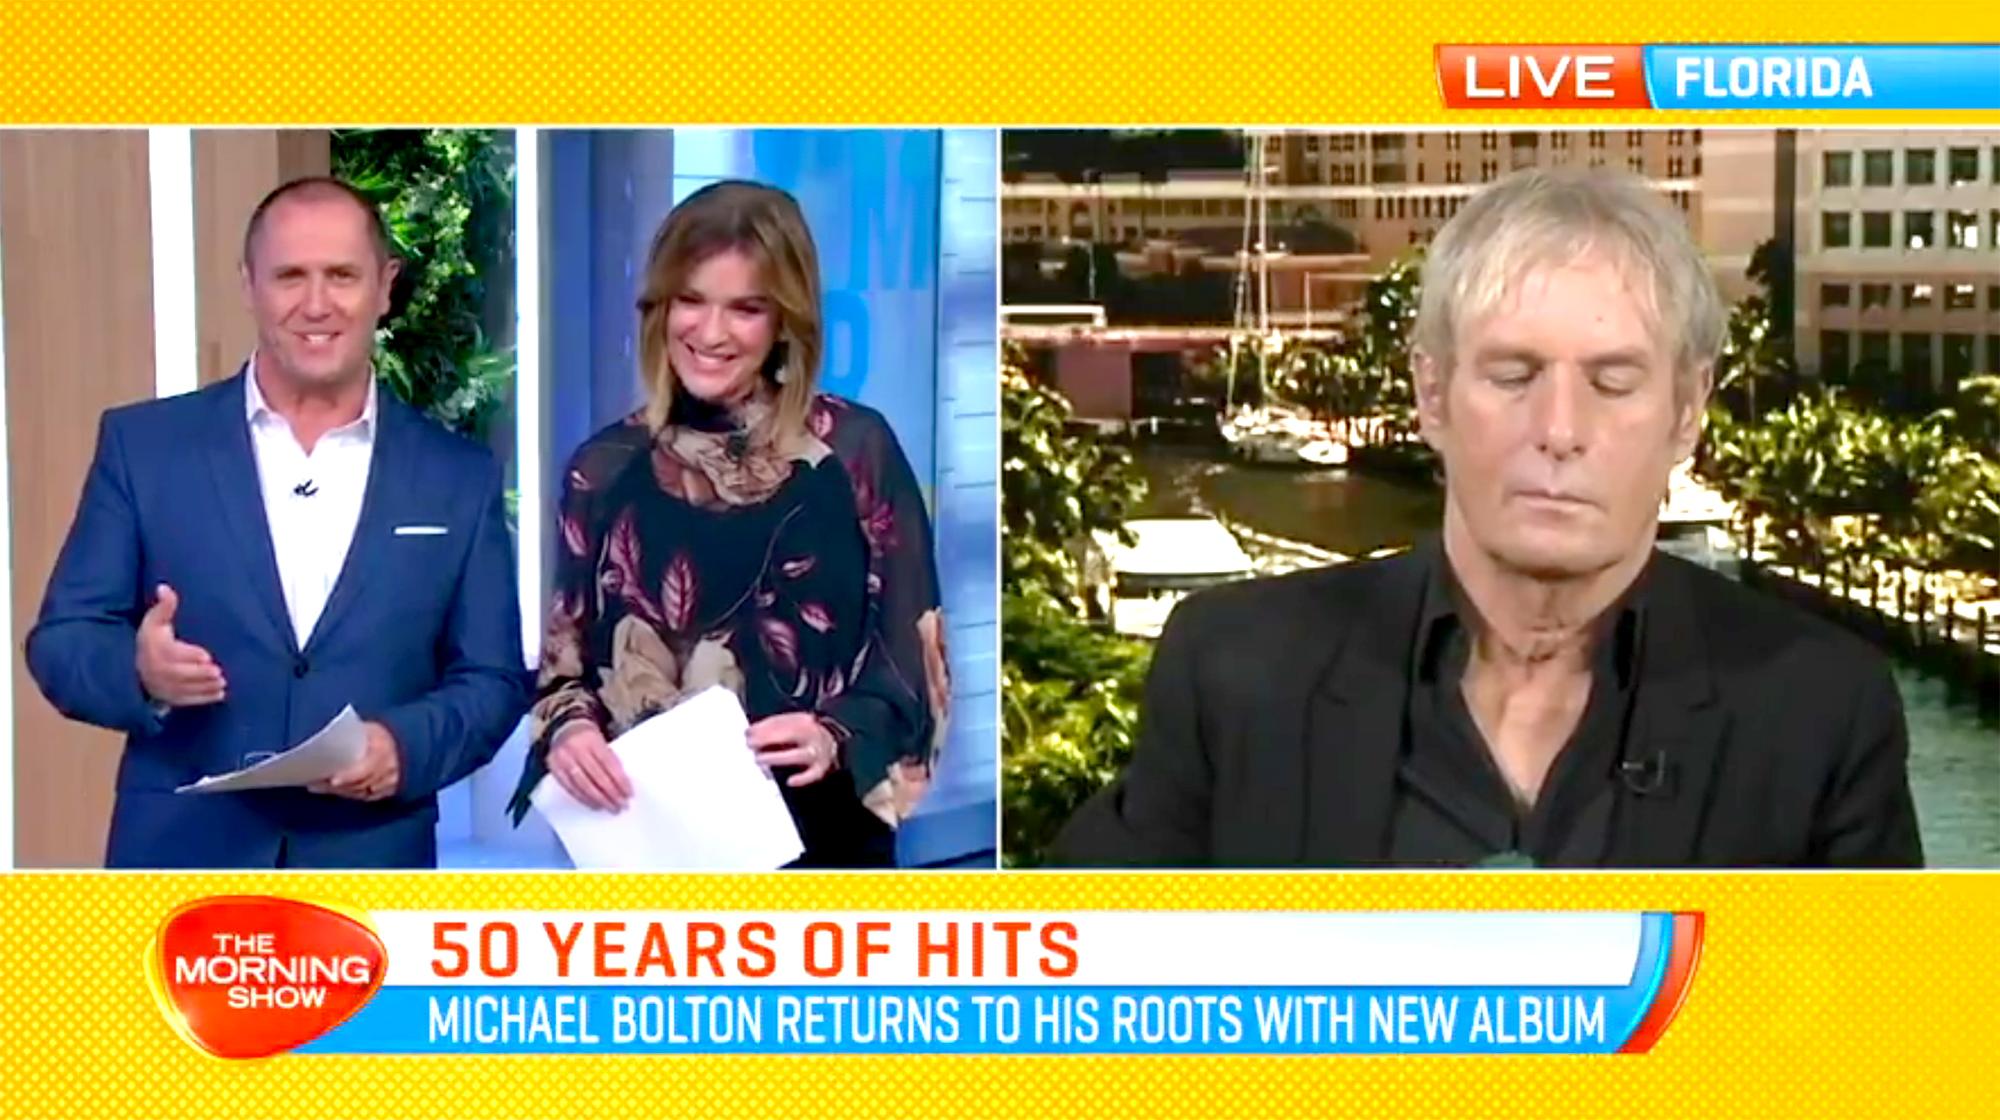 Michael Bolton: I Didn't Fall Asleep on TV!